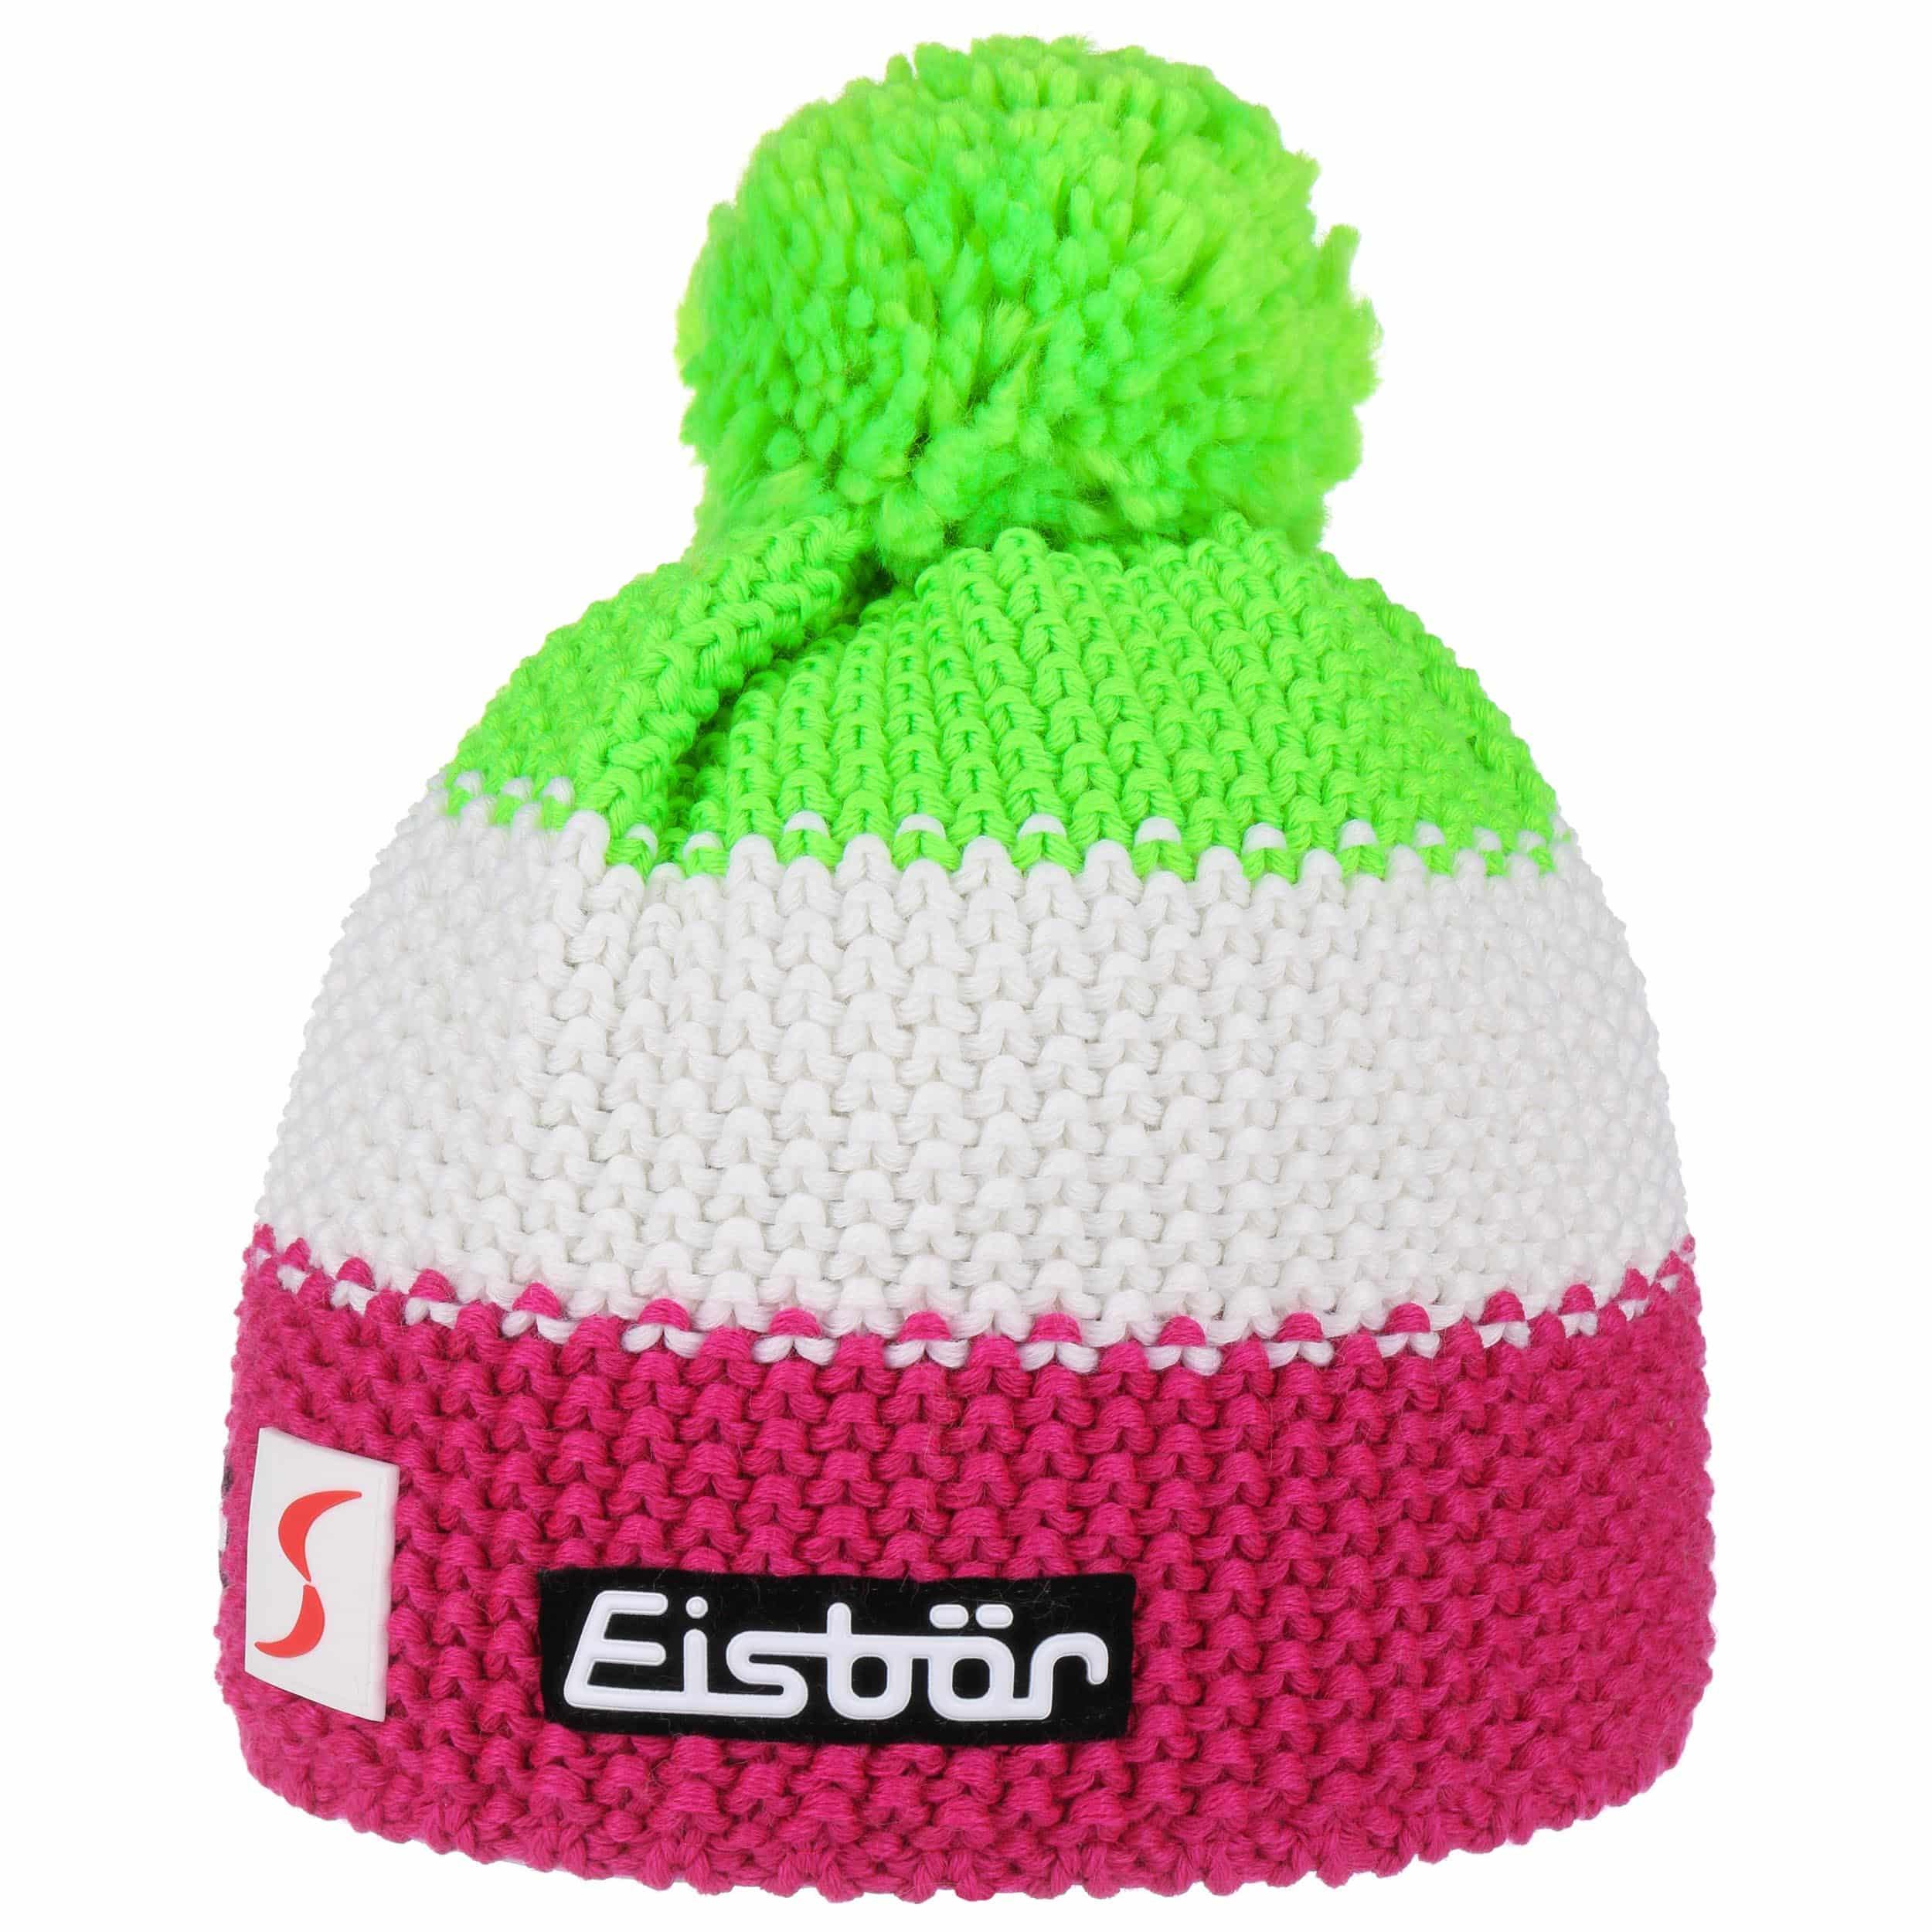 ... Star Neon Bobble Hat by Eisbär - neon green 3 ... effd4051369f